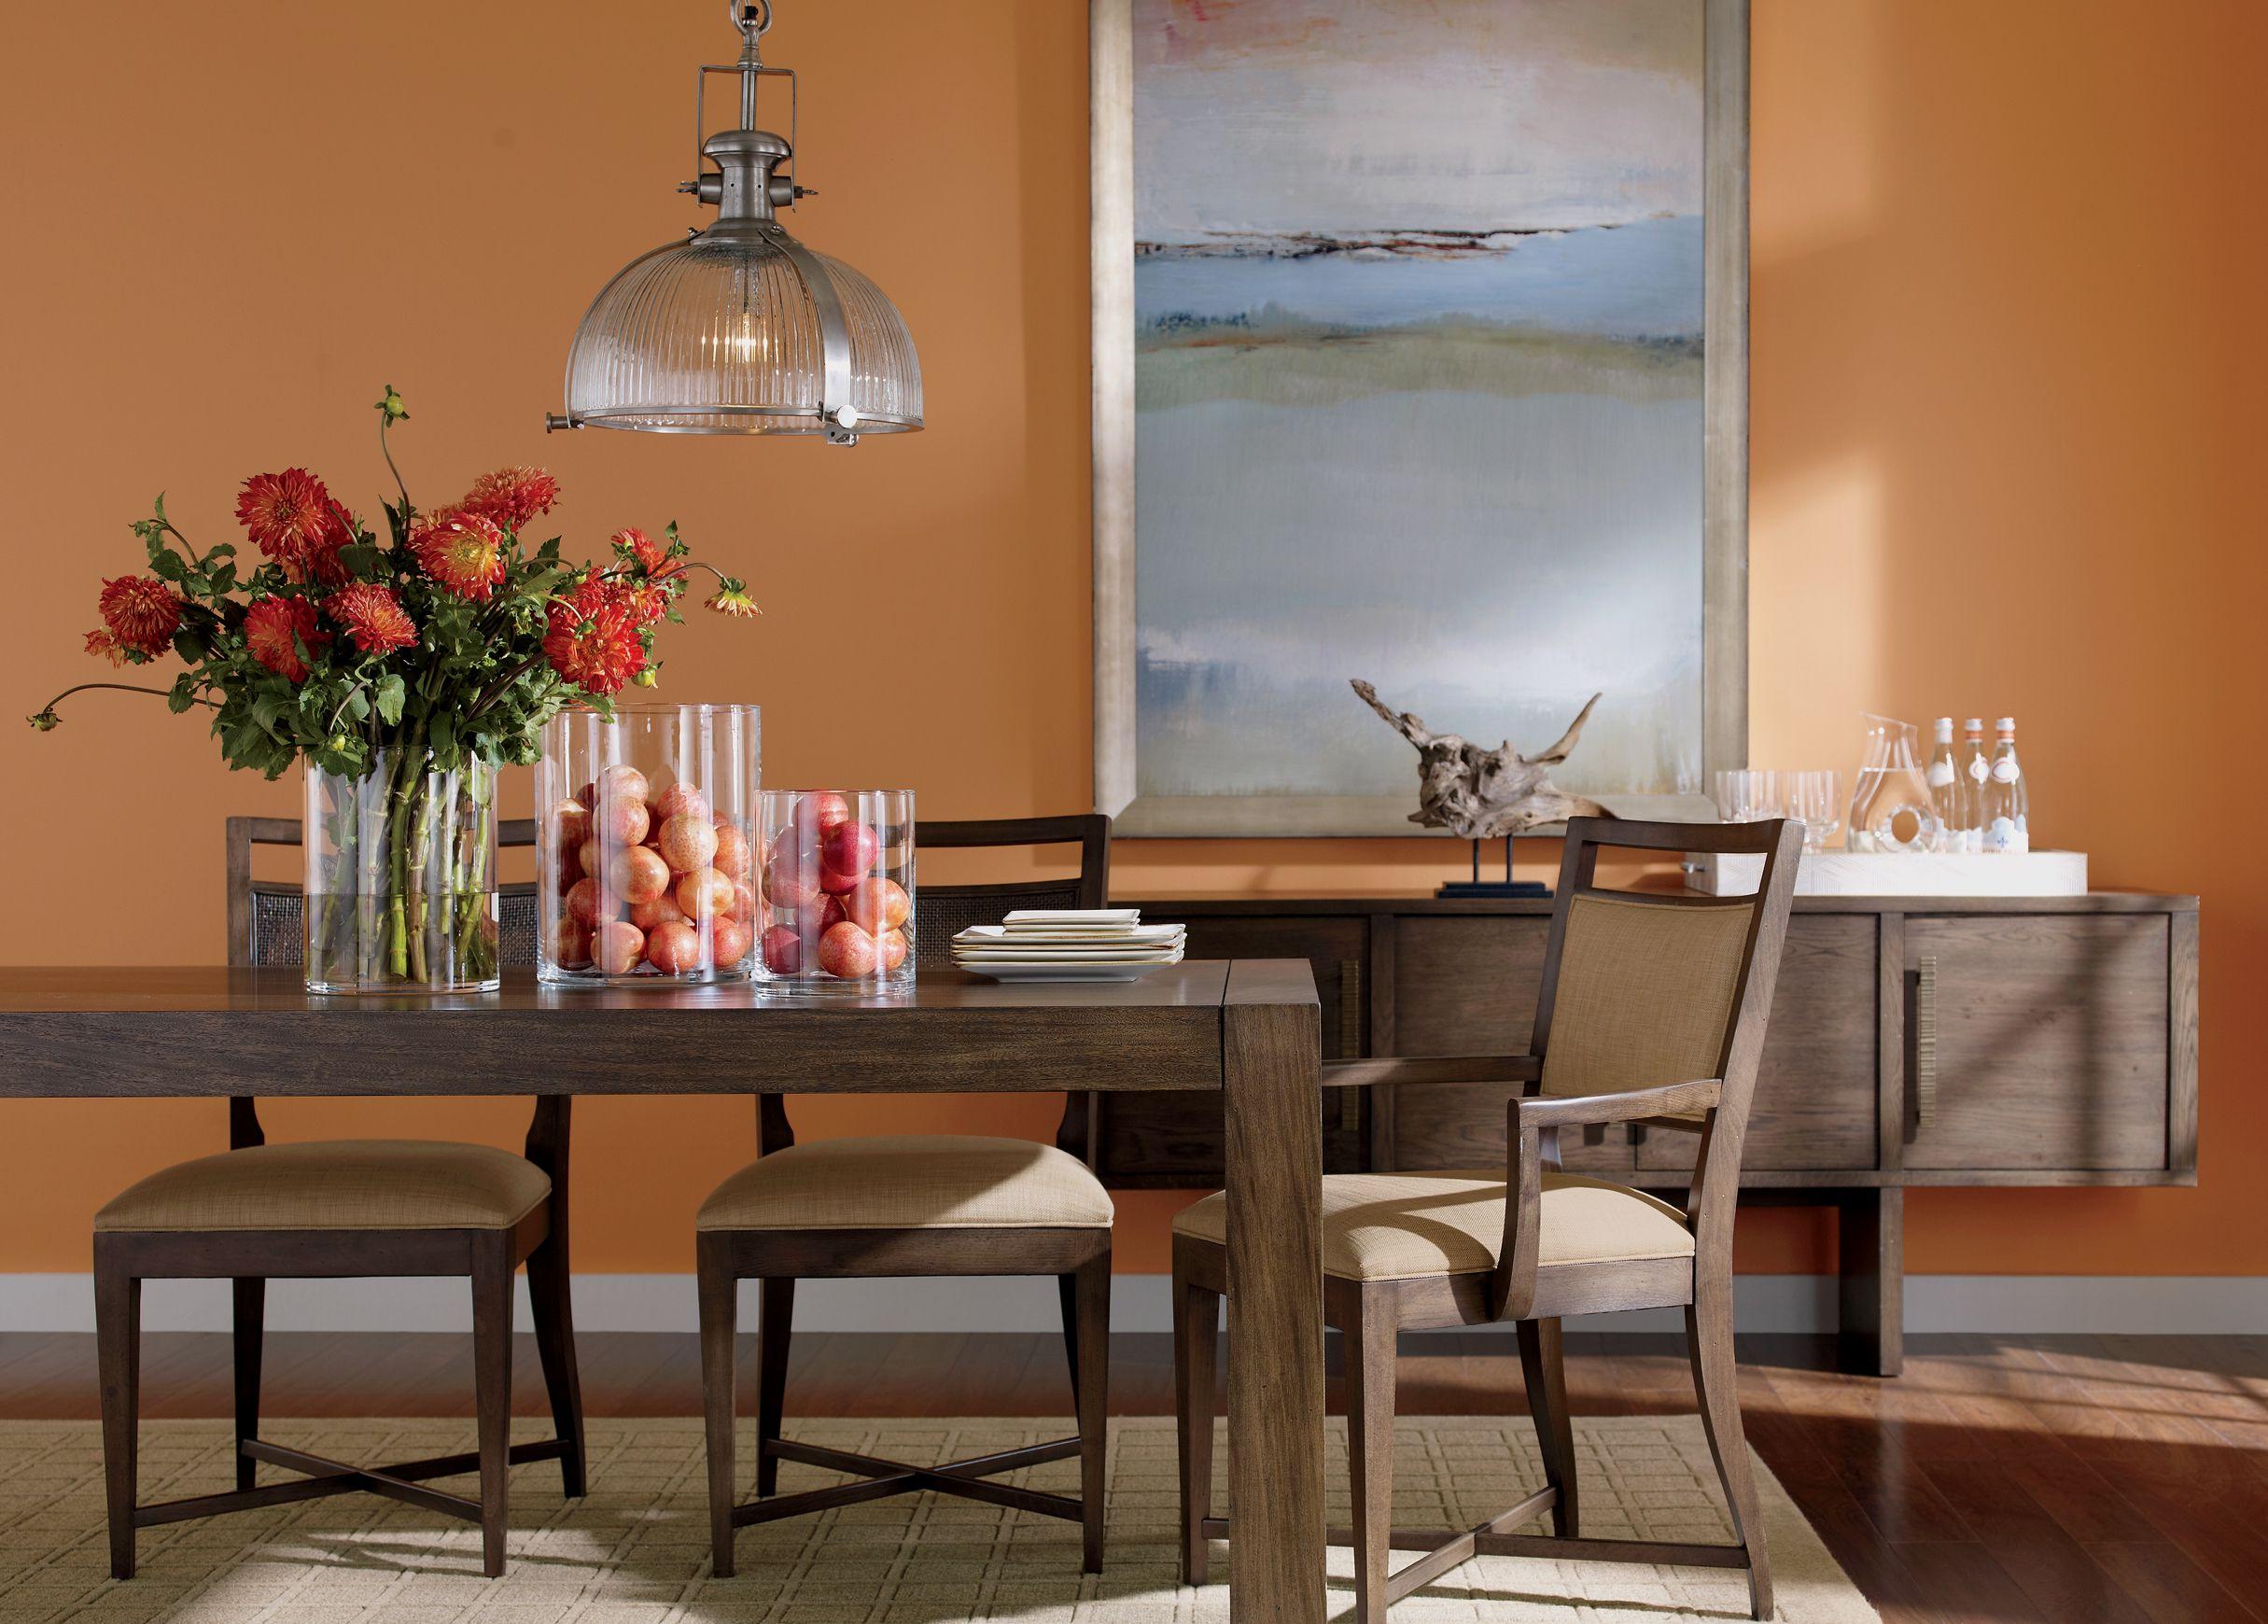 Mid-Century Modern dining room. #EthanAllen #EthanAllenBellevue #MidCentury #DiningRoom